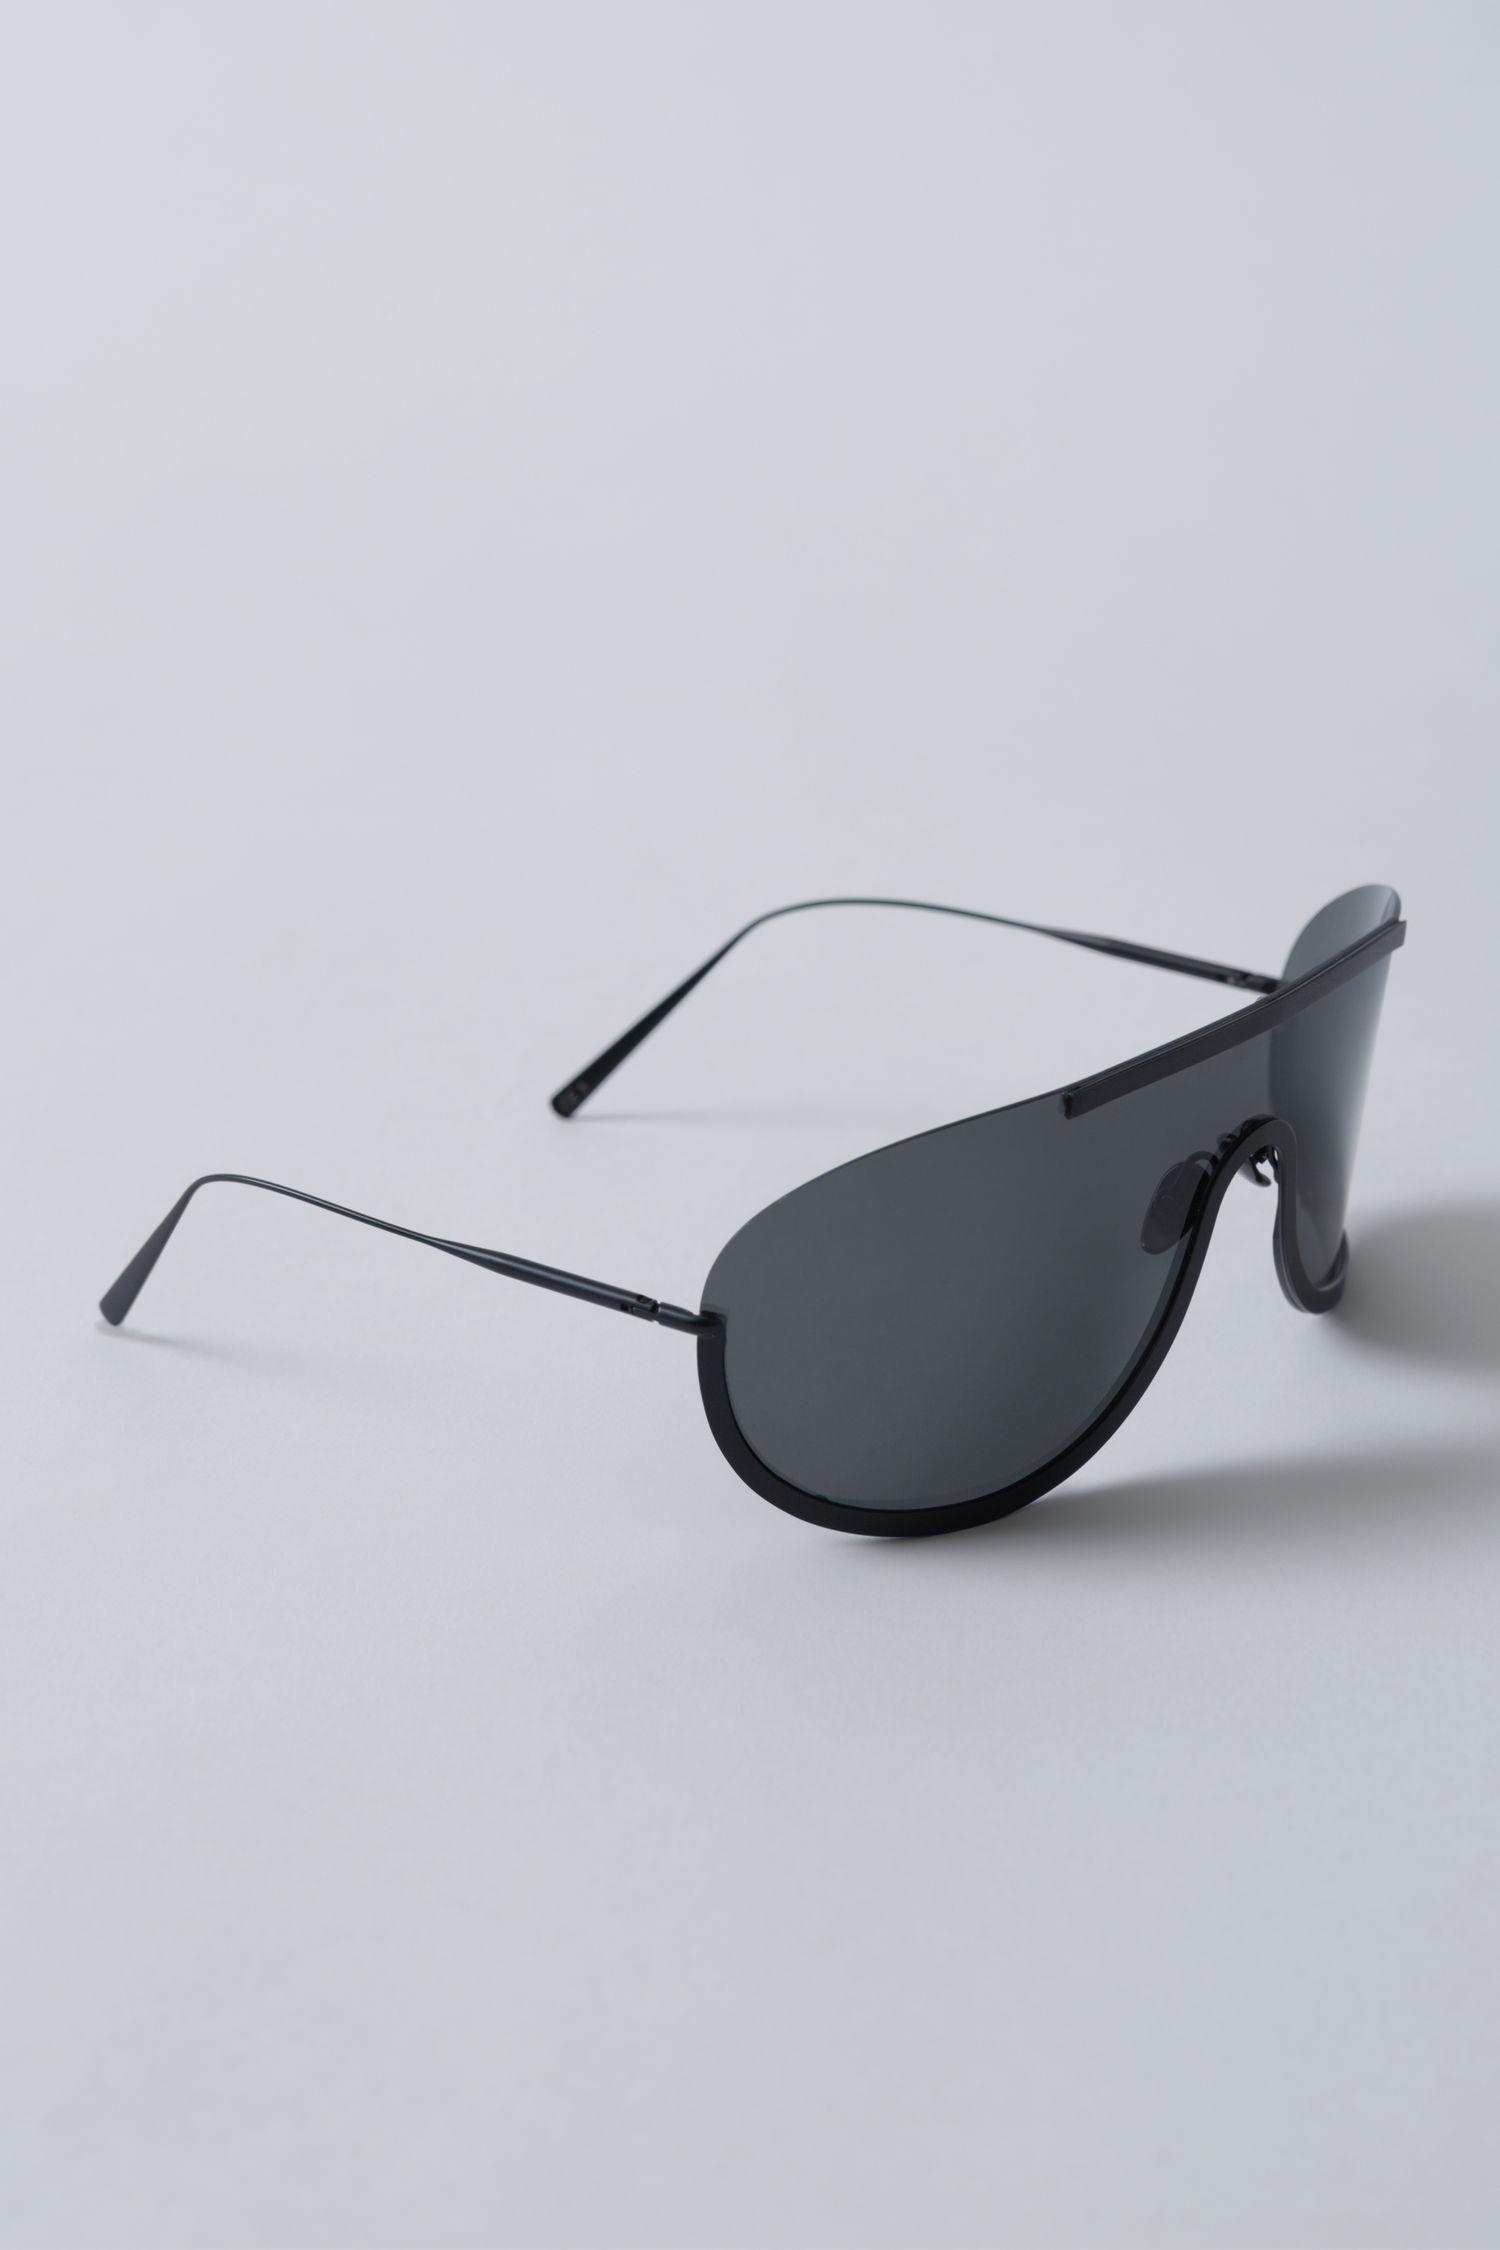 e1ee06e430c7 Lyst - Acne Studios Futuristic Eyewear black in Black